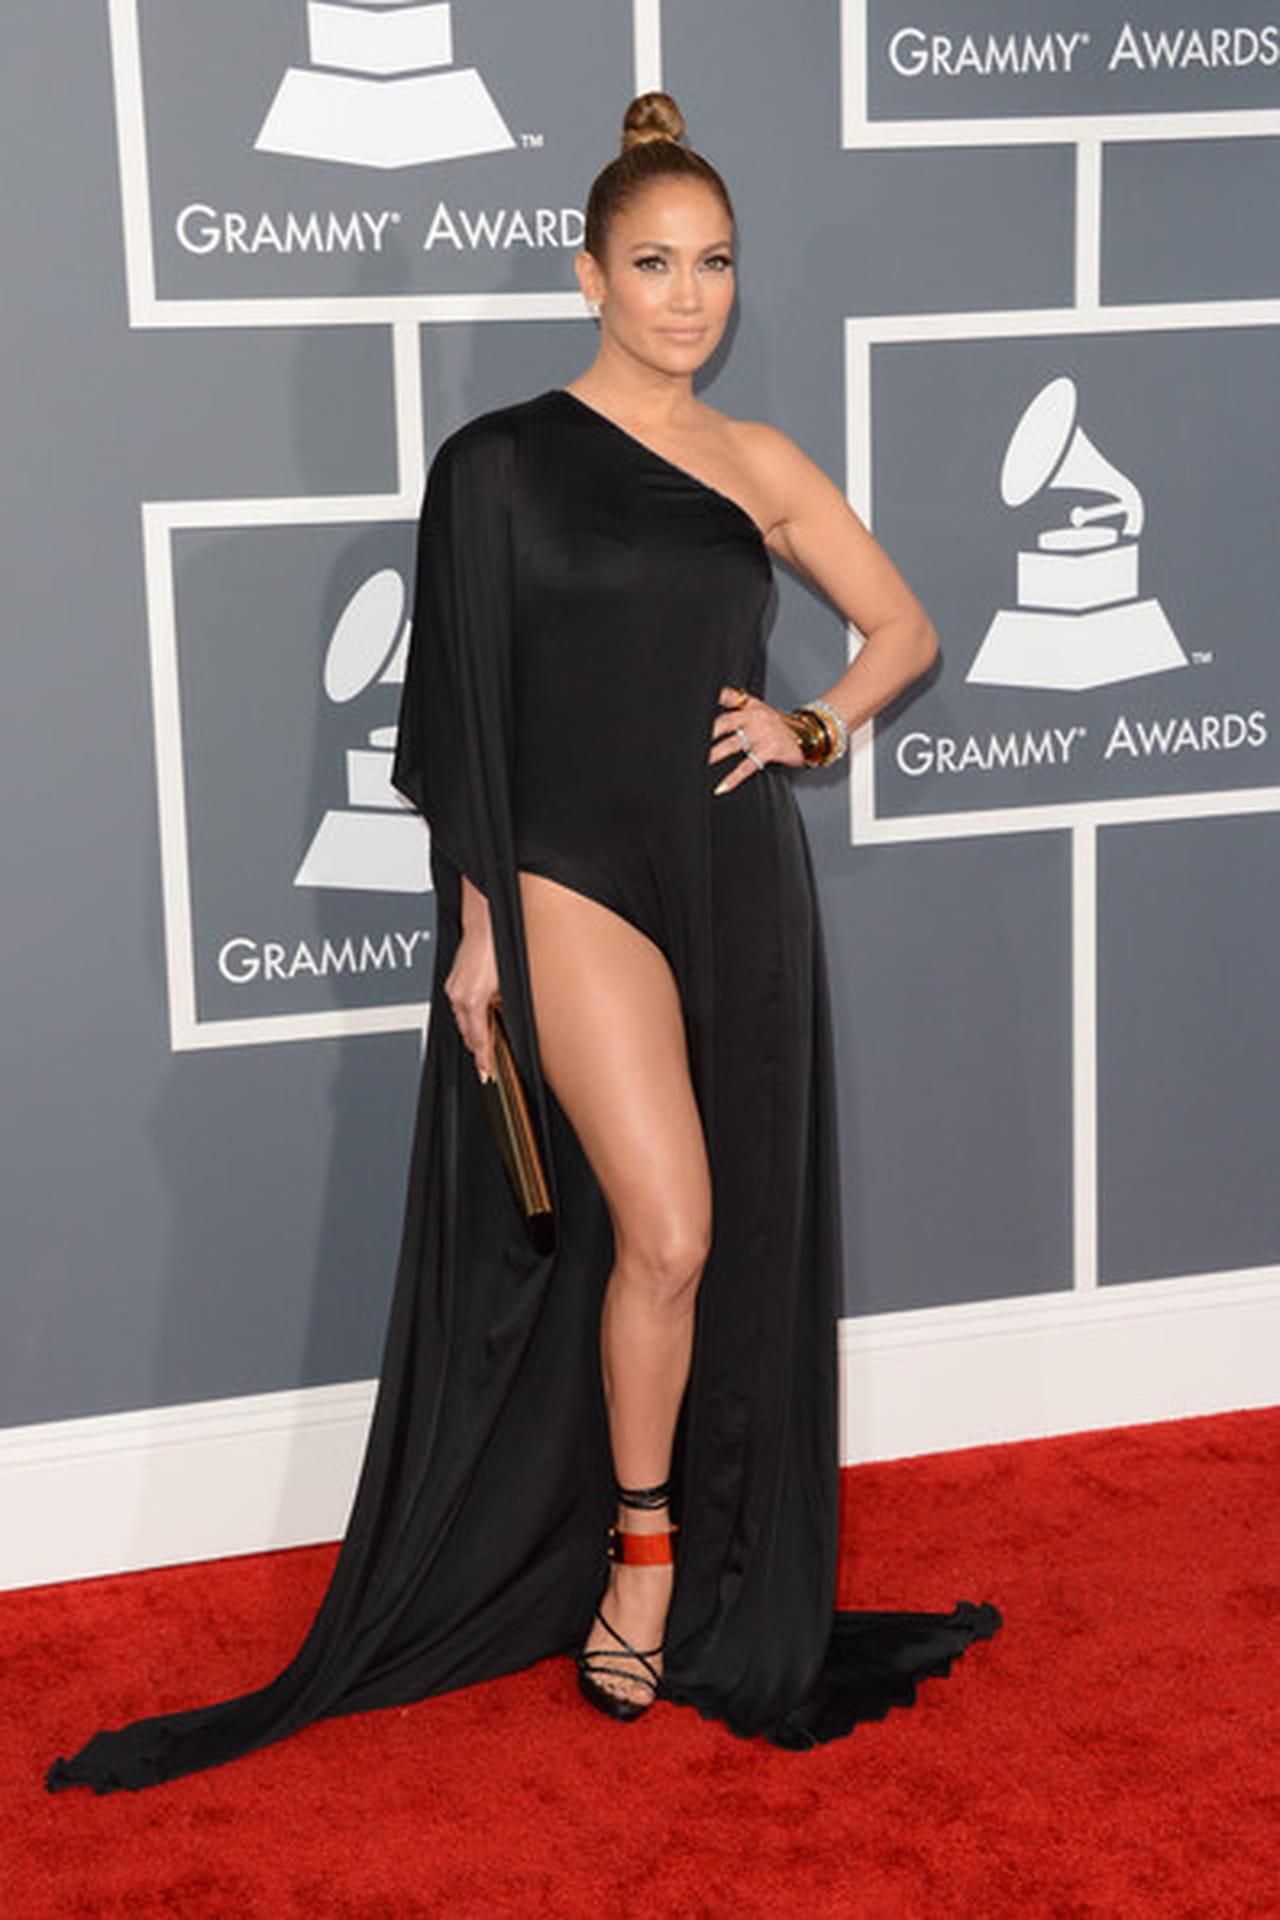 17348b1c4c8c4 اطلالات جينفر لوبيز Jennifer Lopez المميزة!